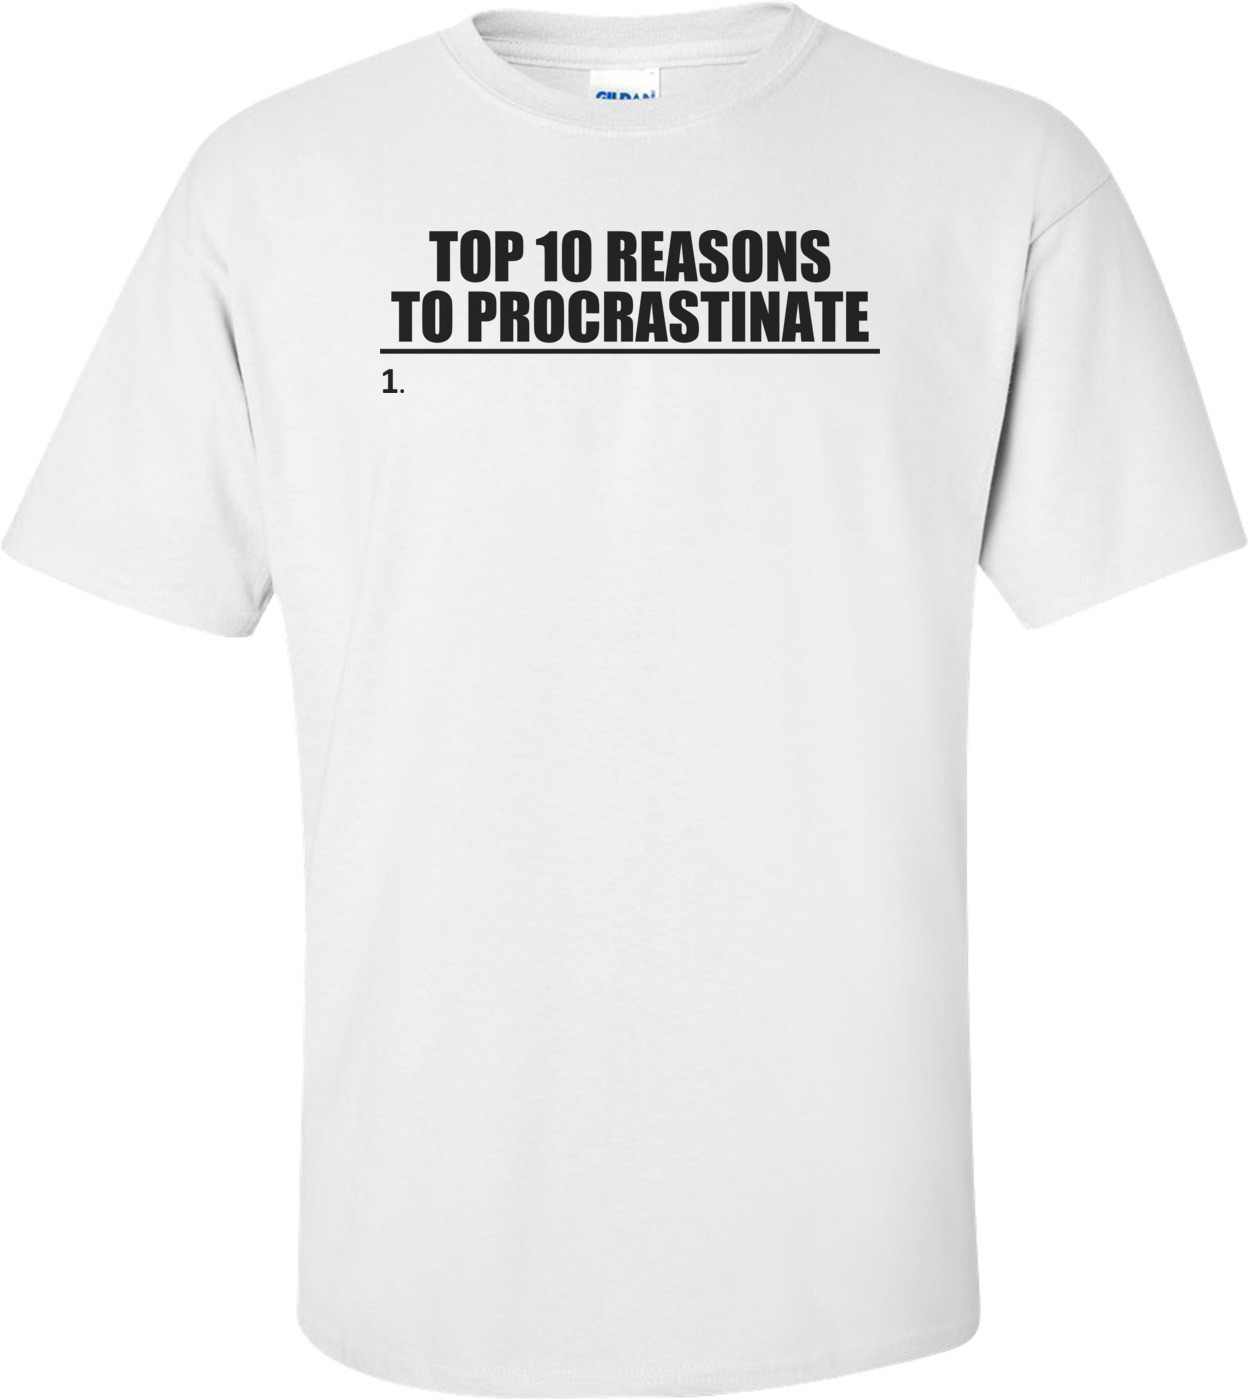 Top 10 Reasons To Procrastinate Funny Shirt